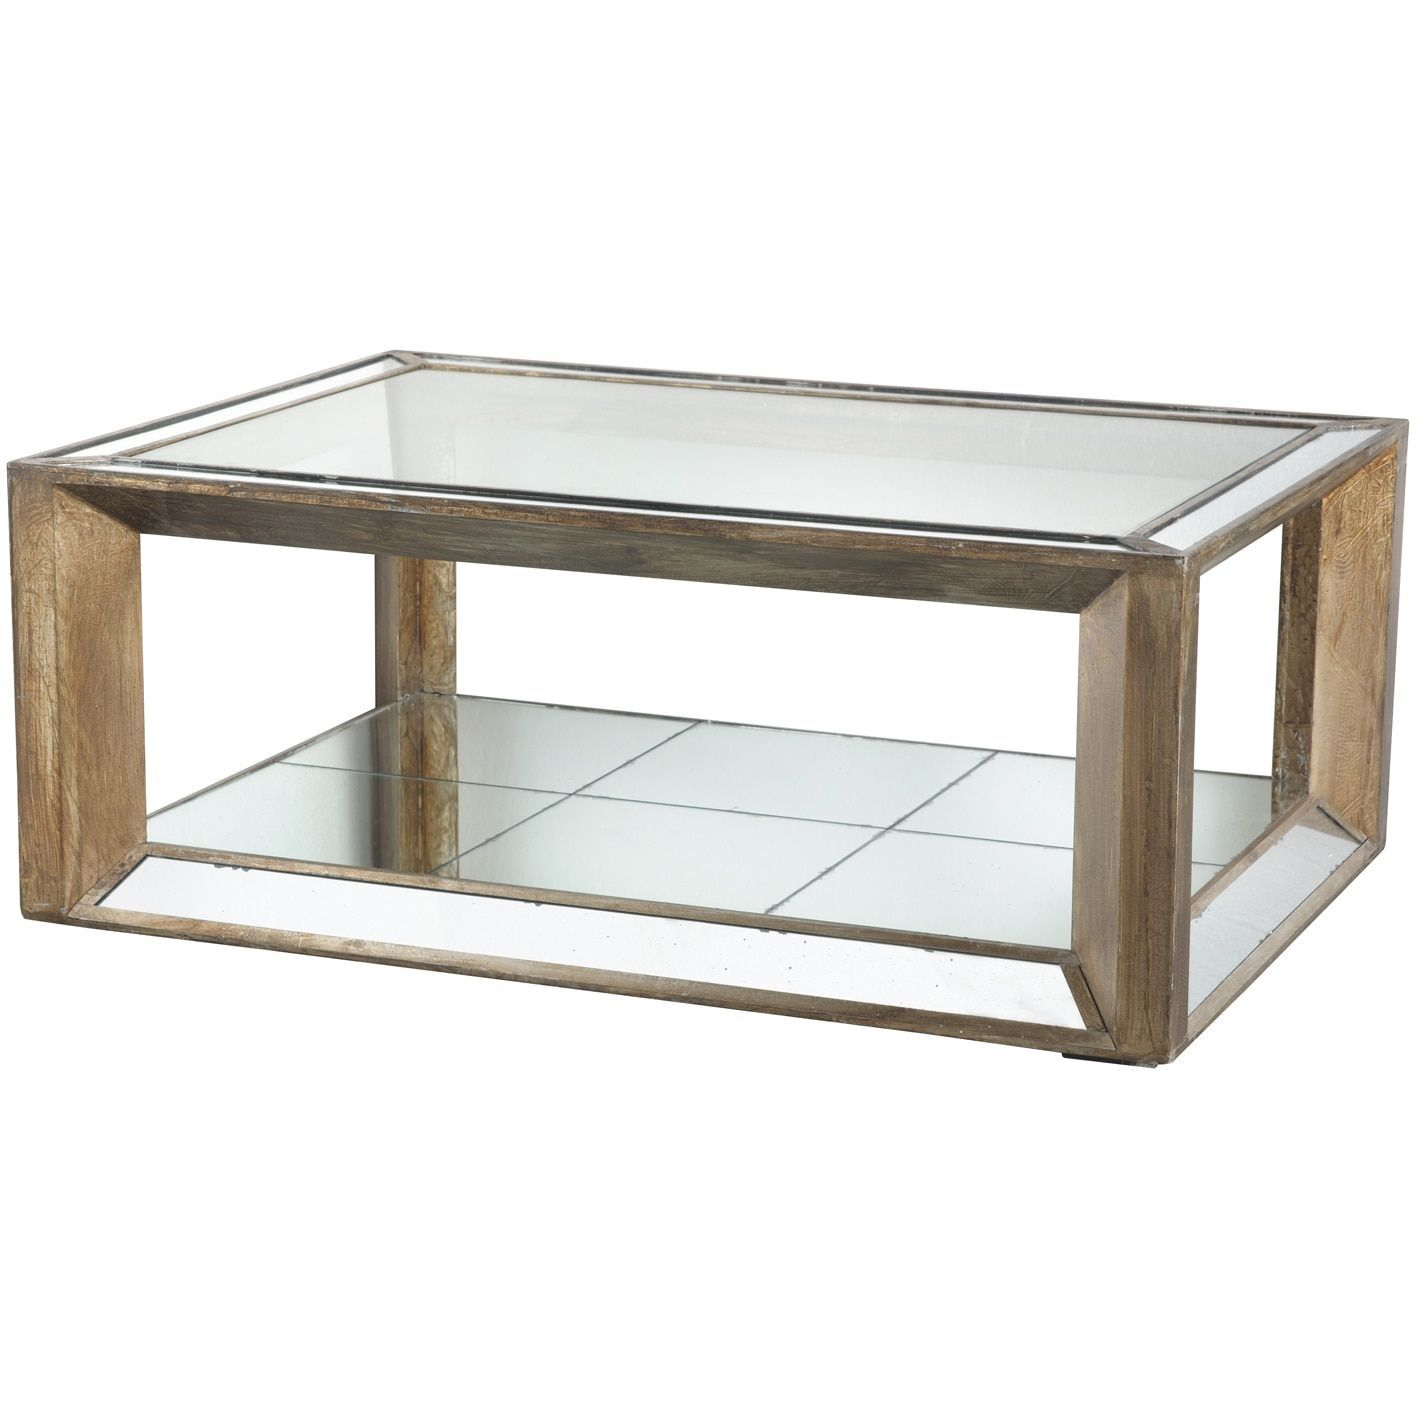 Julia Wood Glass Mirrored Coffee Table 51x35 3x20 3 Mirrored